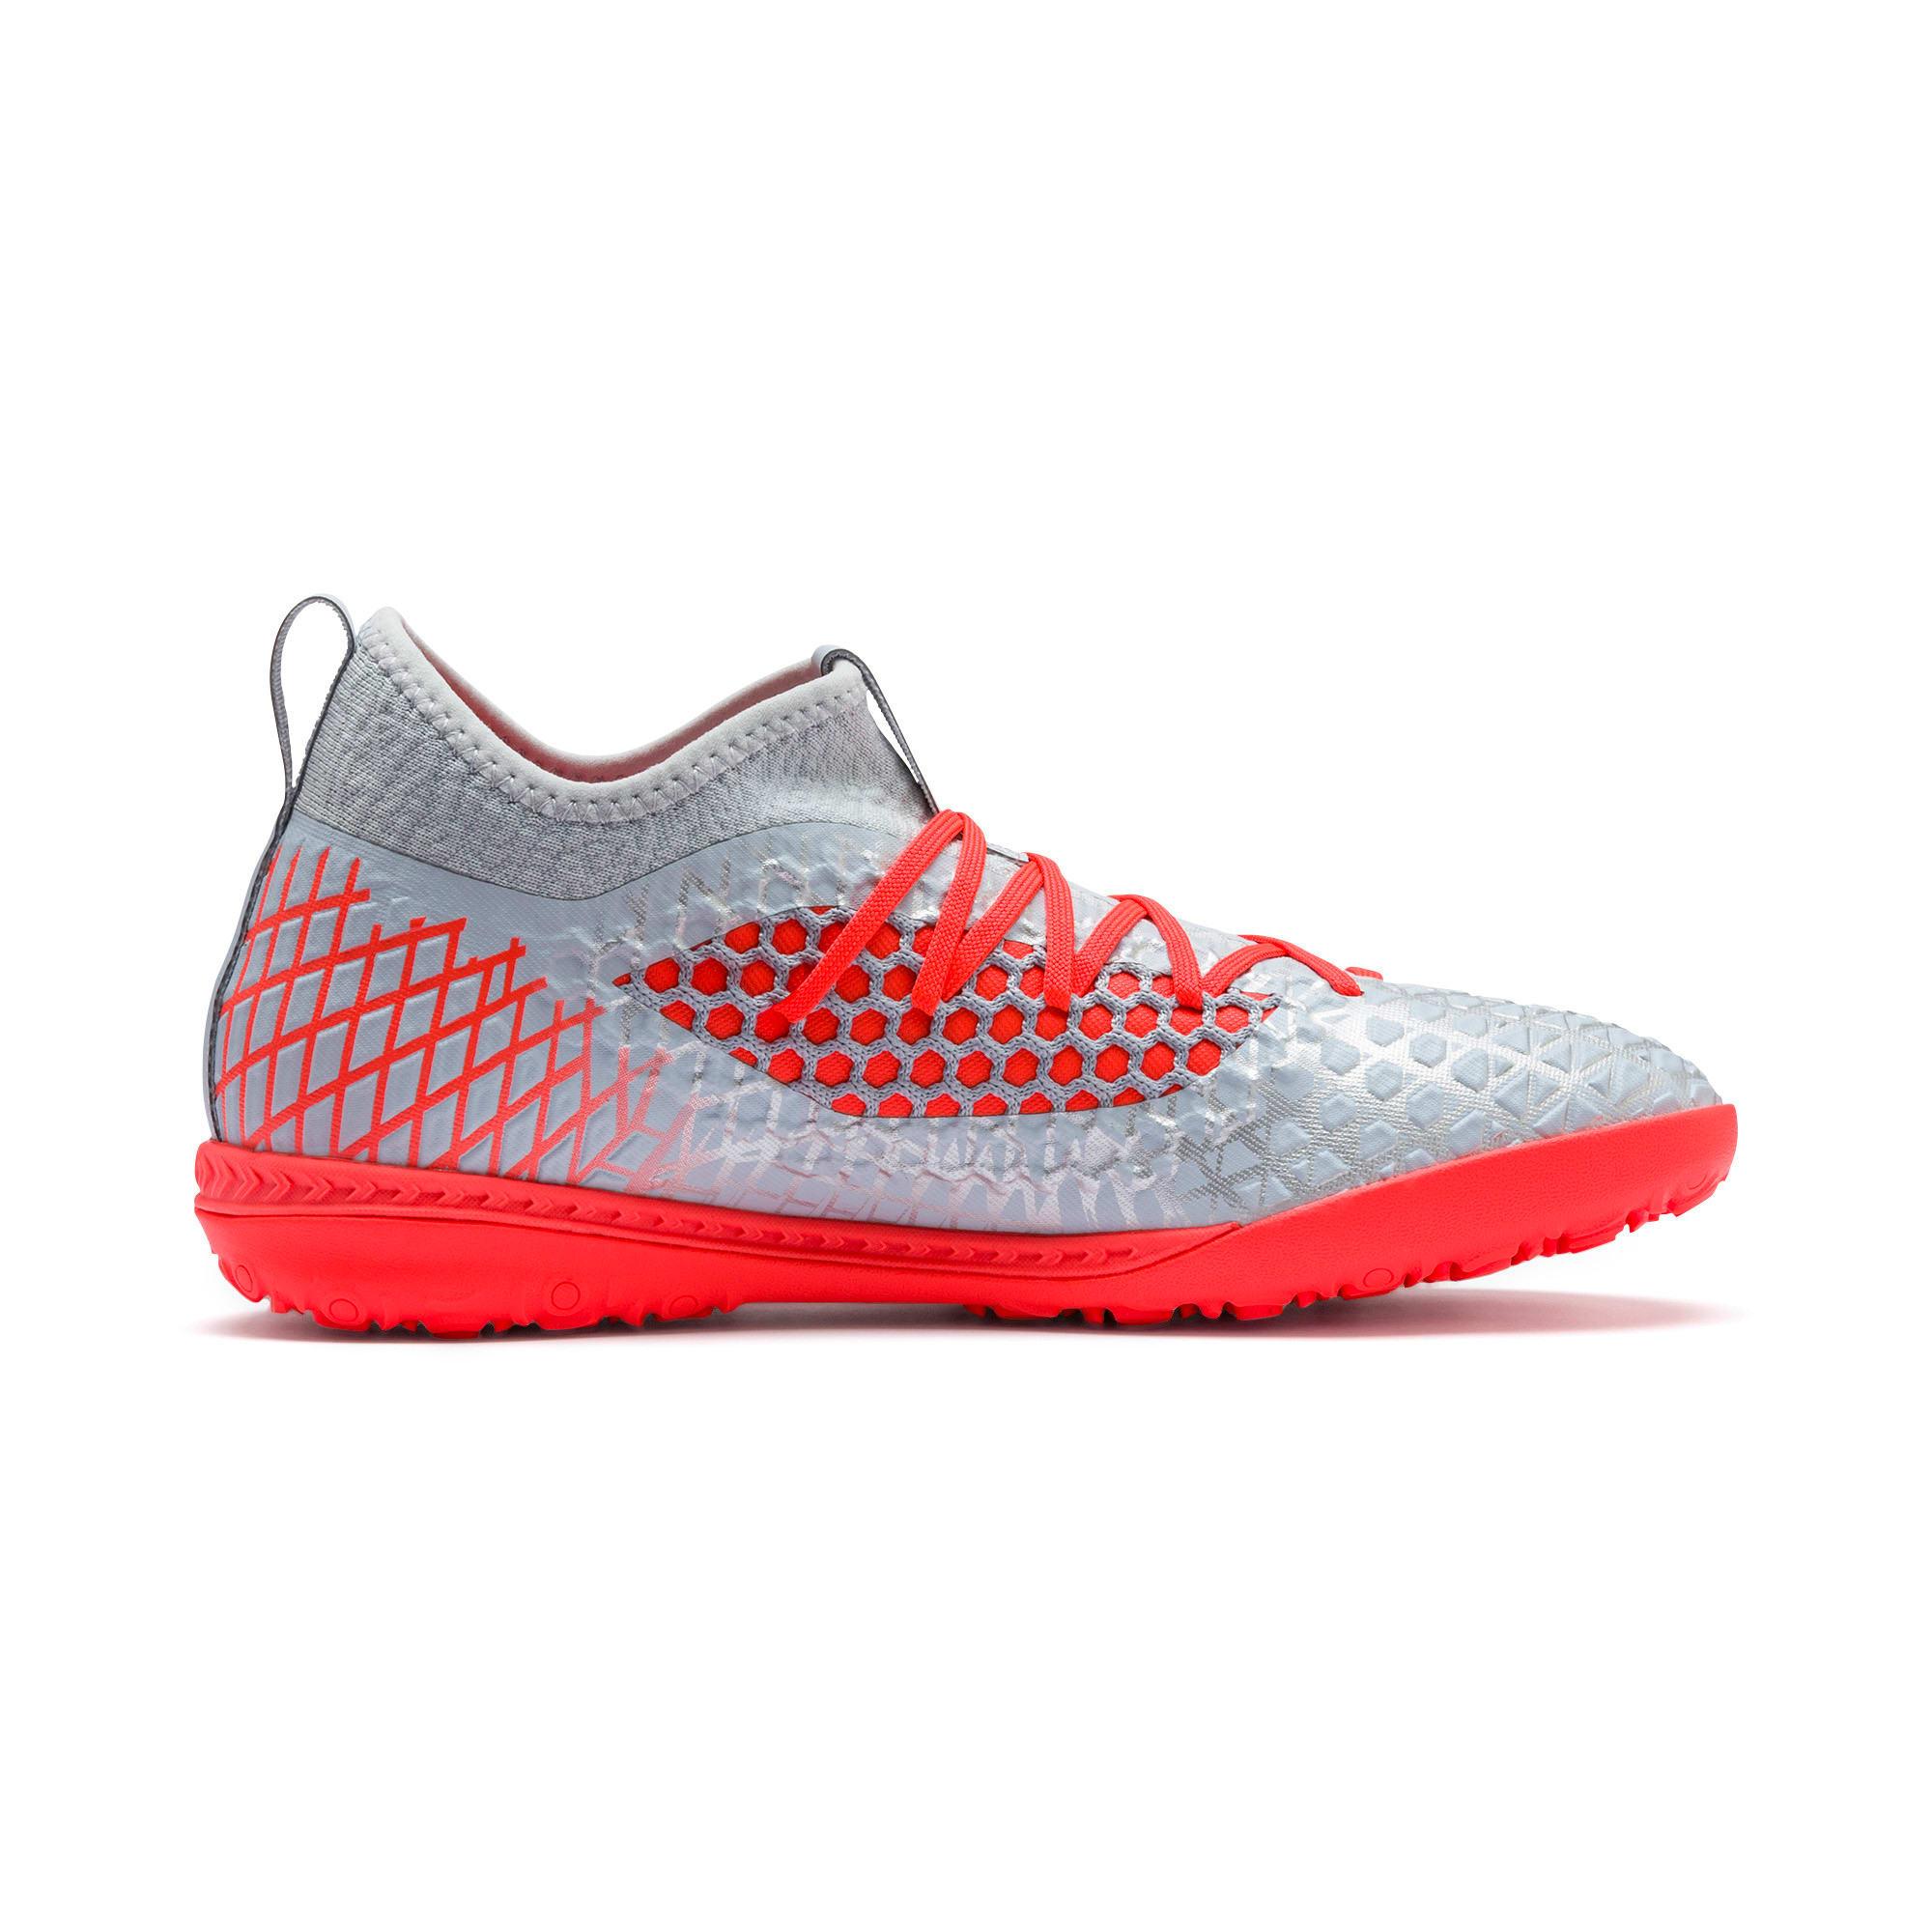 Thumbnail 6 of FUTURE 4.3 NETFIT TT Men's Soccer Shoes, Glacial Blue-Nrgy Red, medium